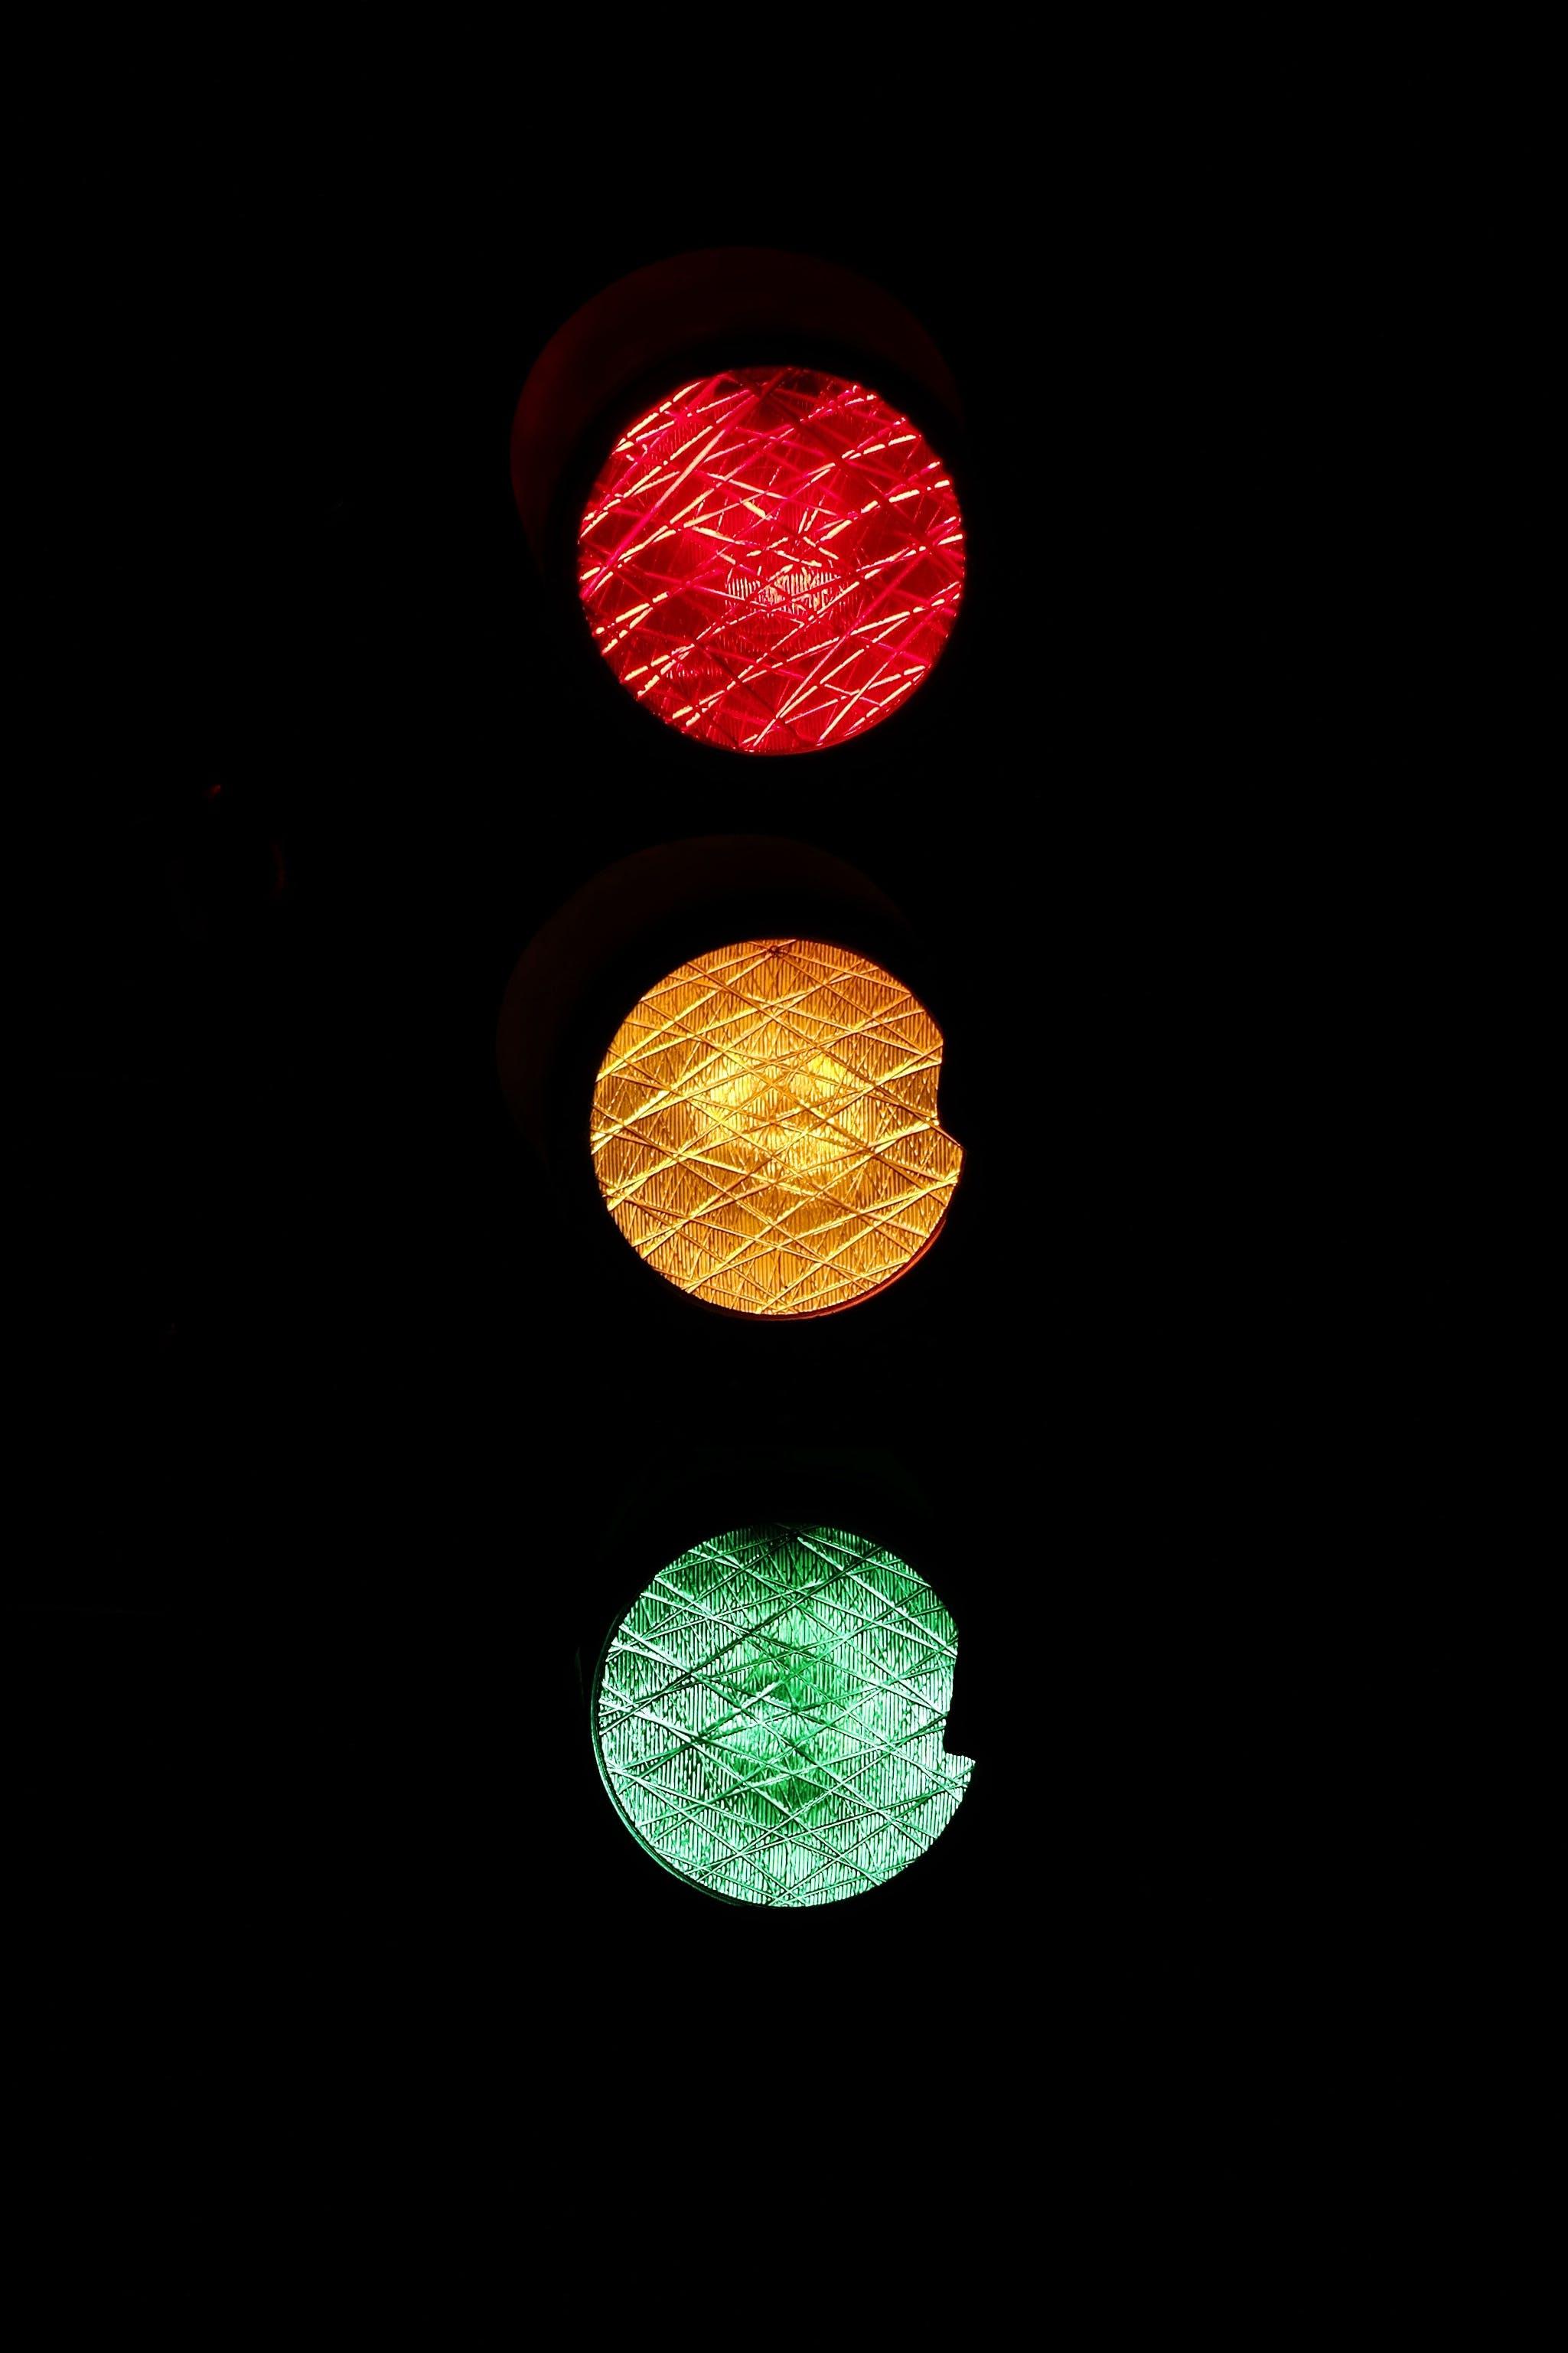 lys, lyssignal, rødt lys